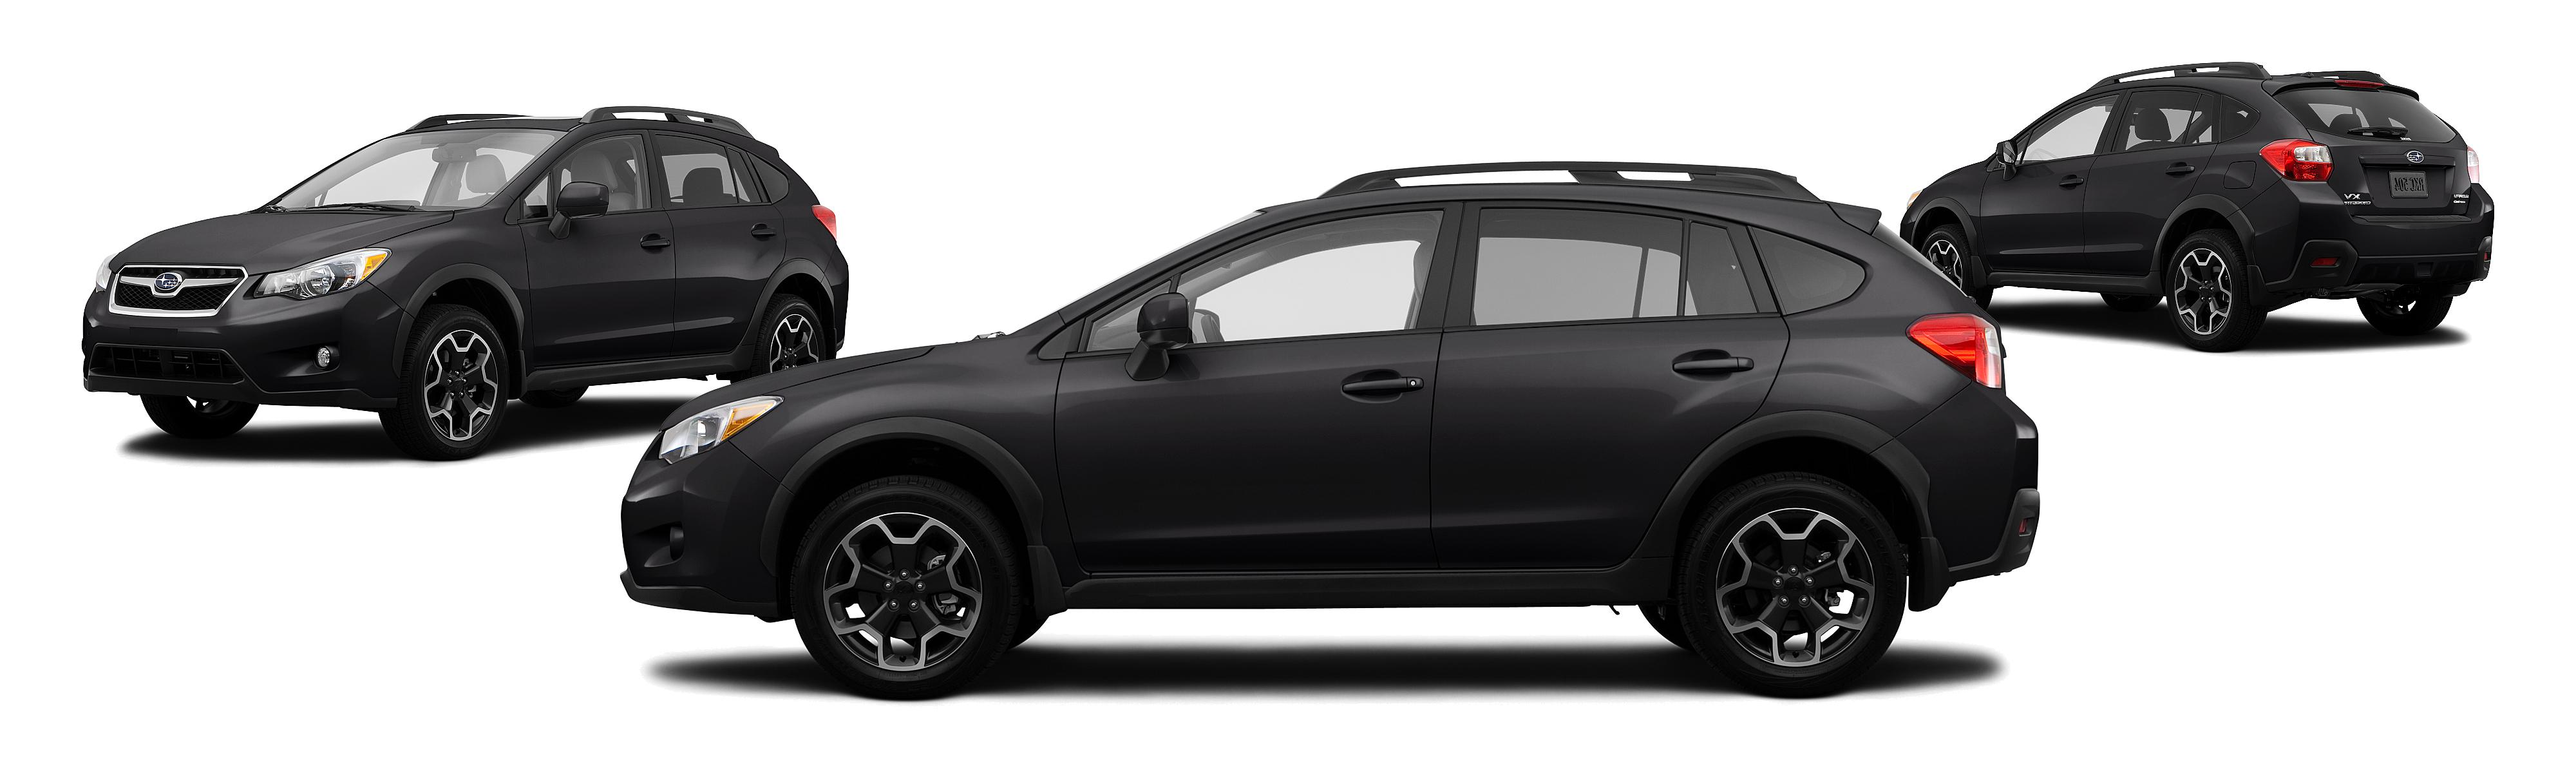 2014 Subaru Xv Crosstrek 2 0i Premium >> 2014 Subaru Xv Crosstrek Awd 2 0i Premium 4dr Crossover Cvt